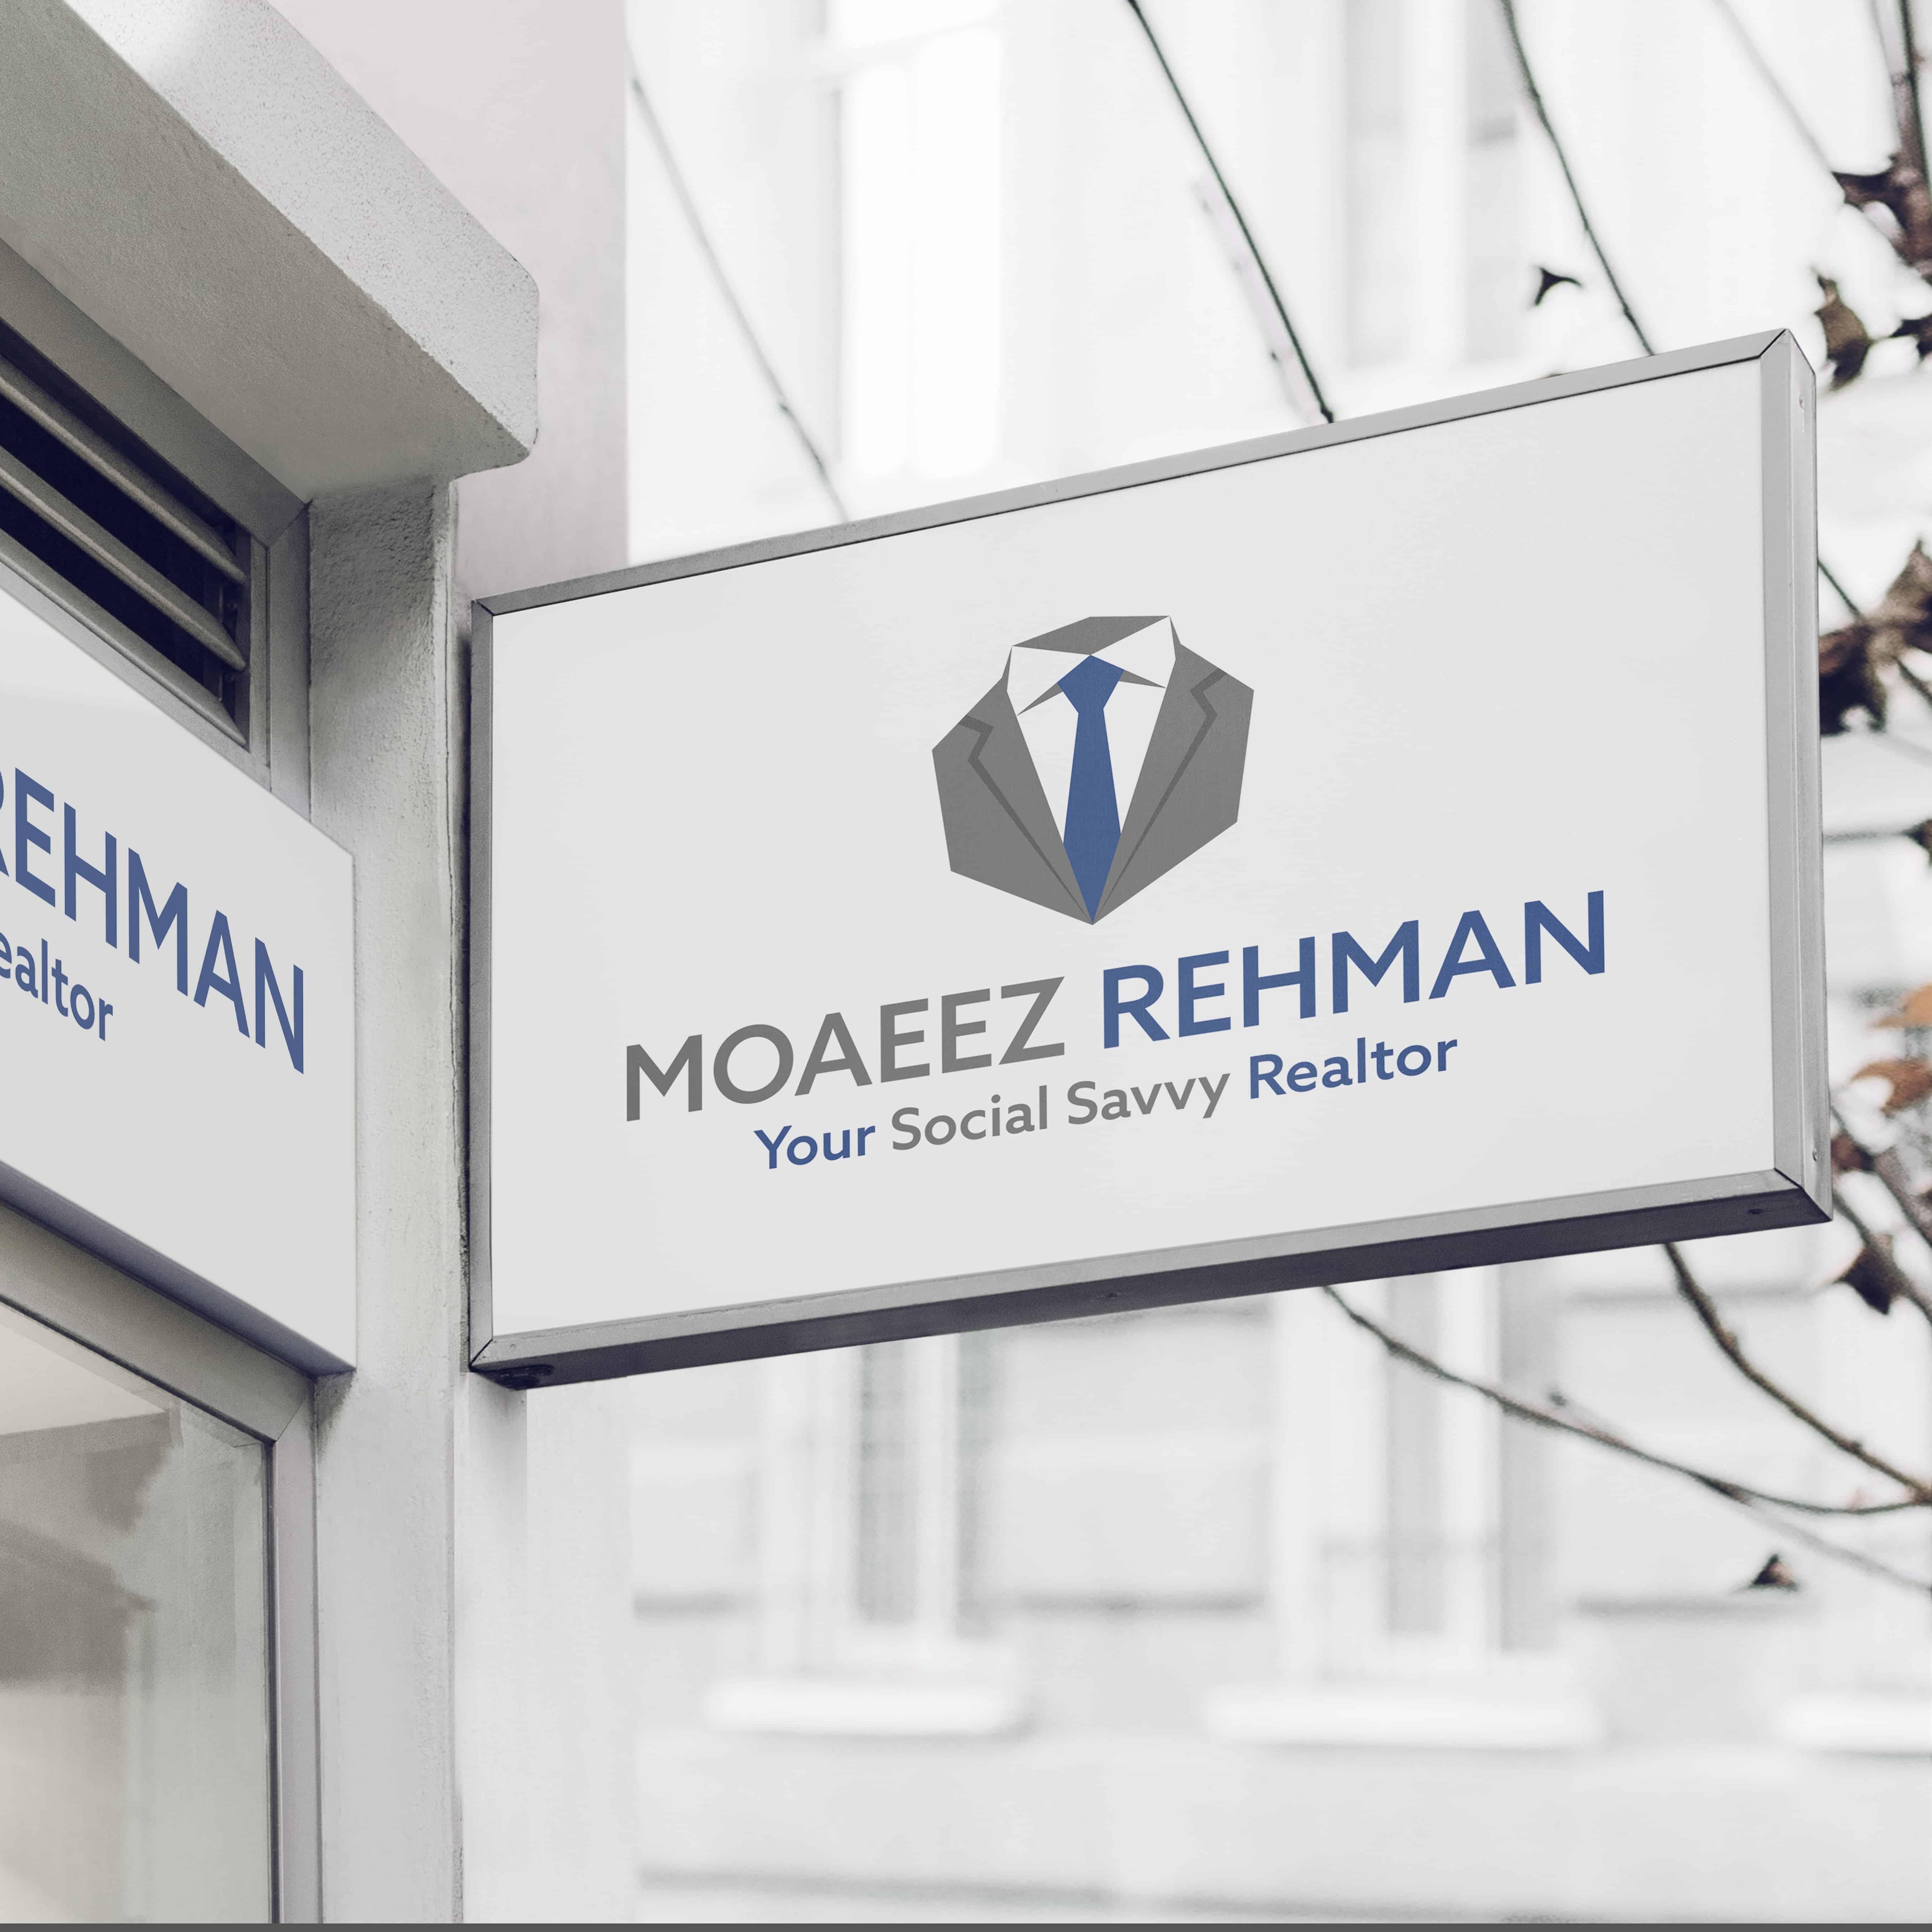 Maoeez Rehman